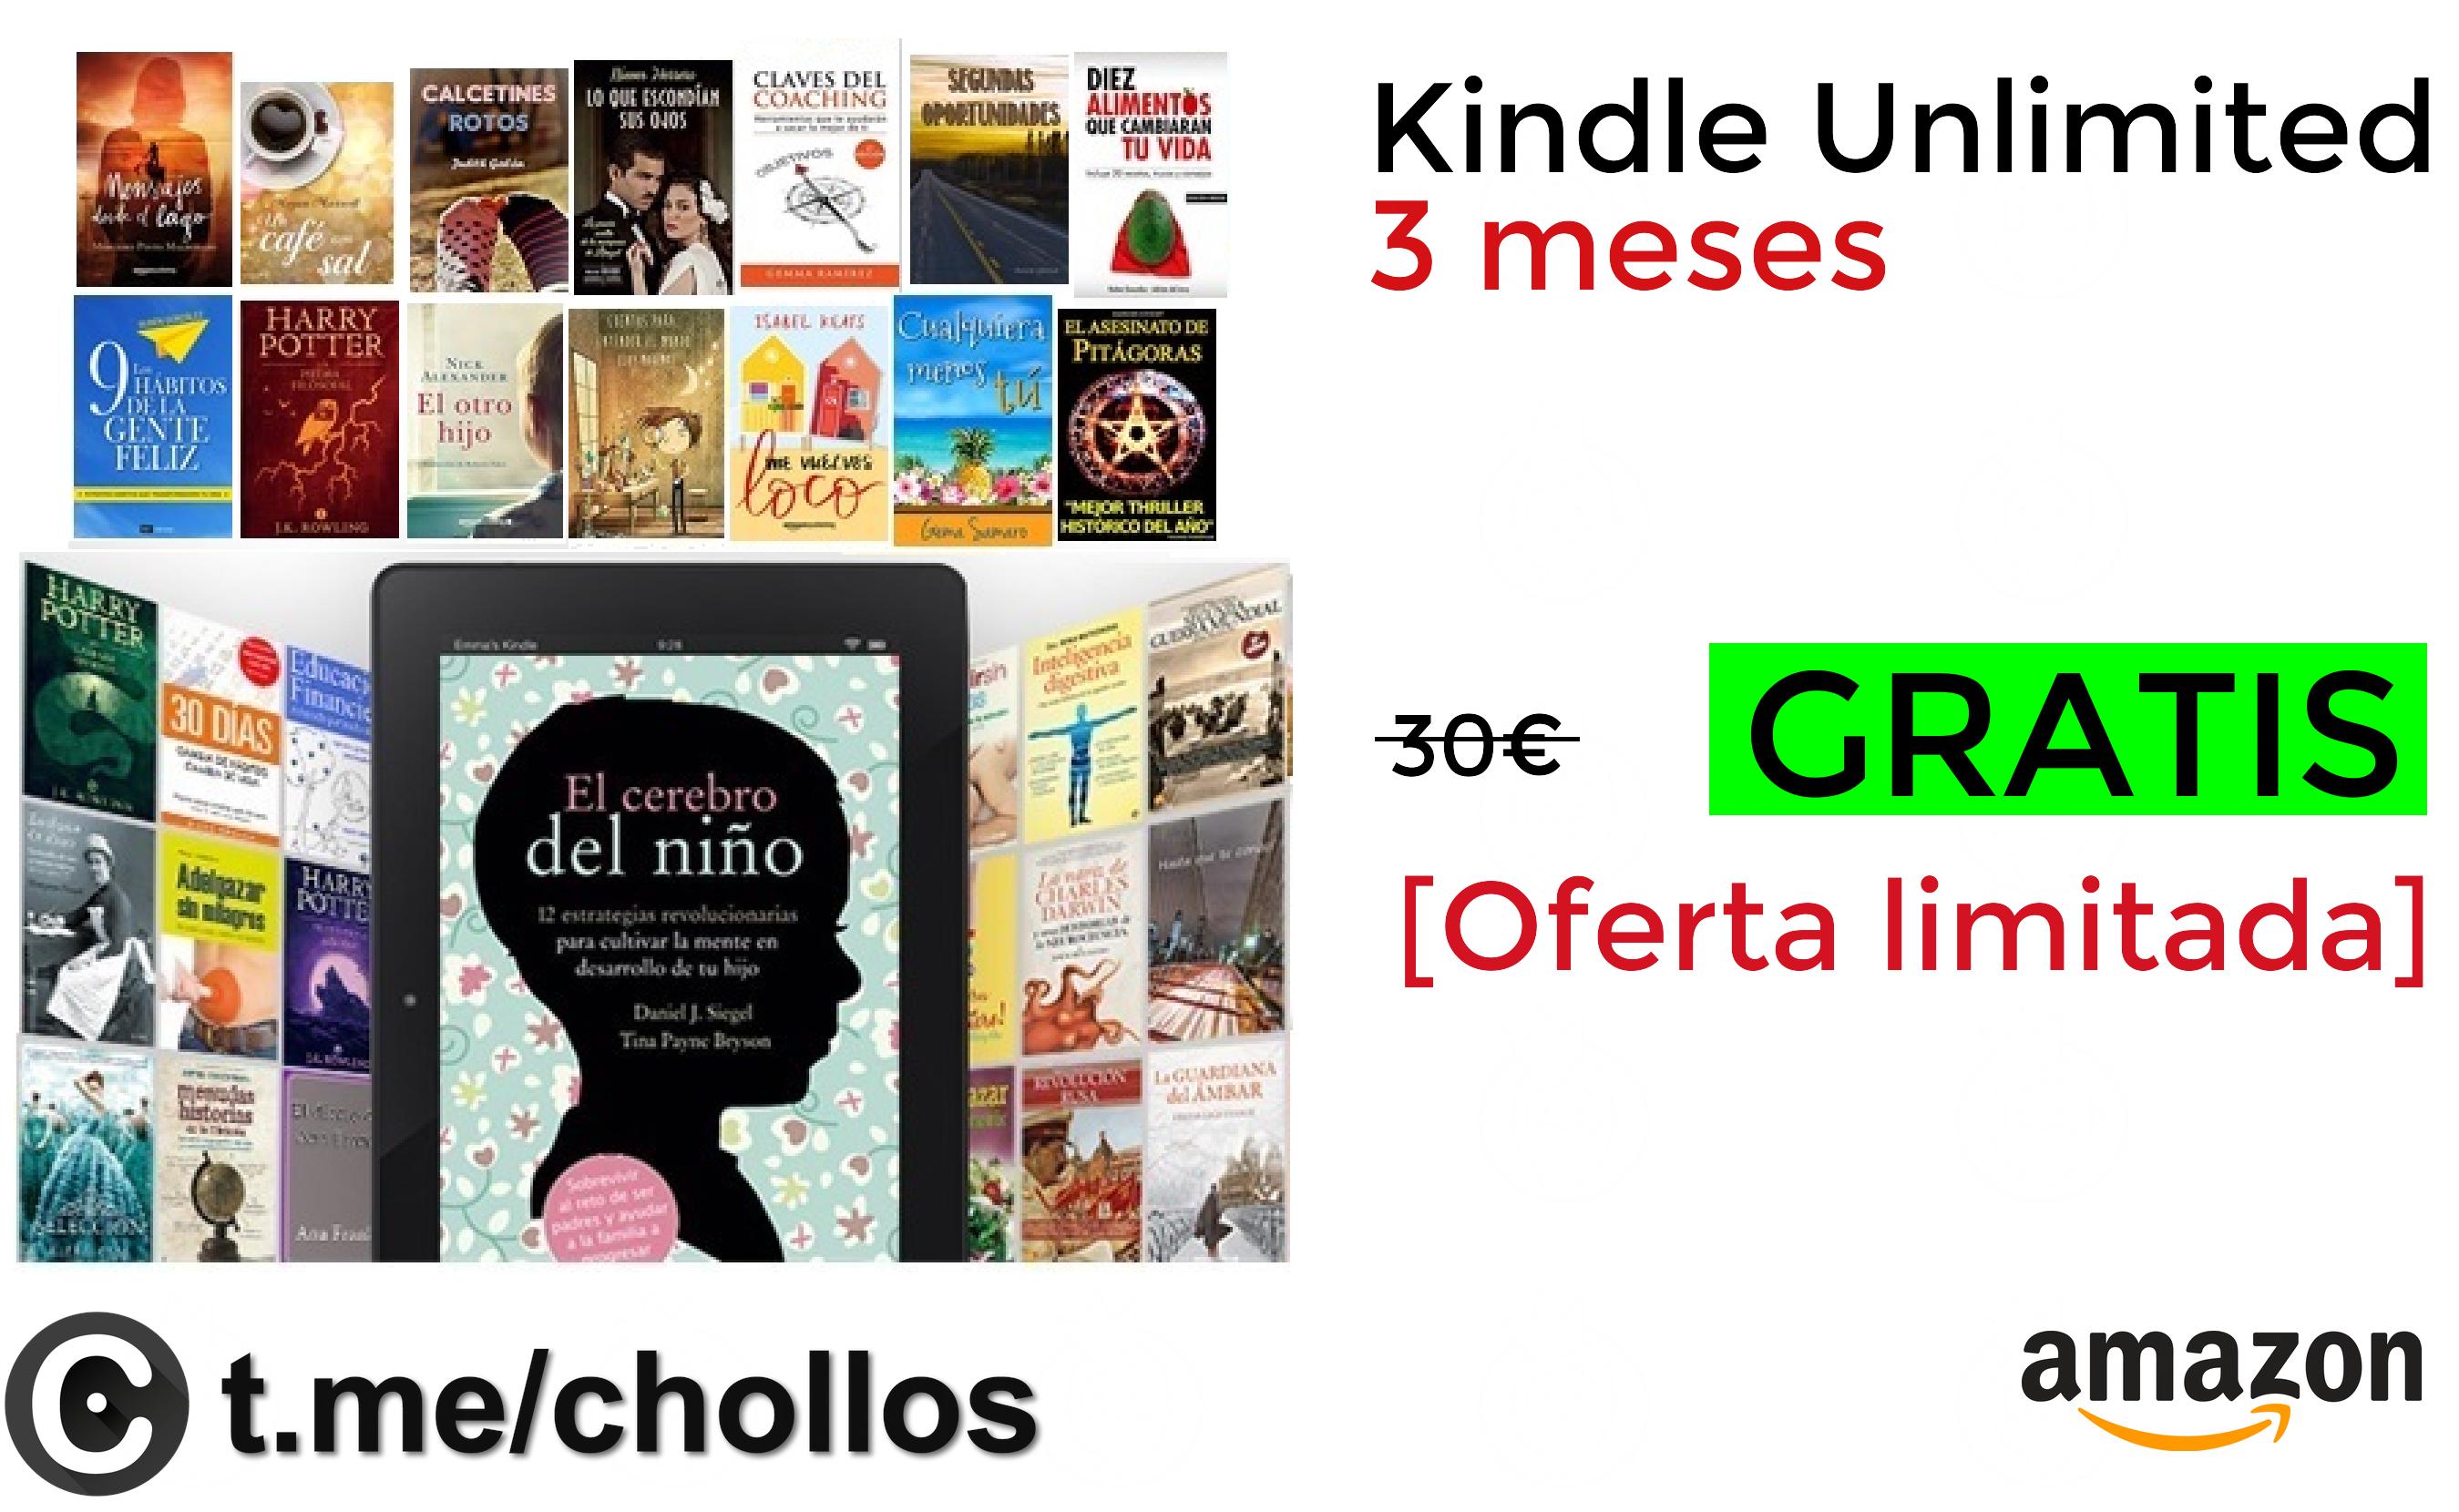 Kindle Unlimited 3 meses GRATIS